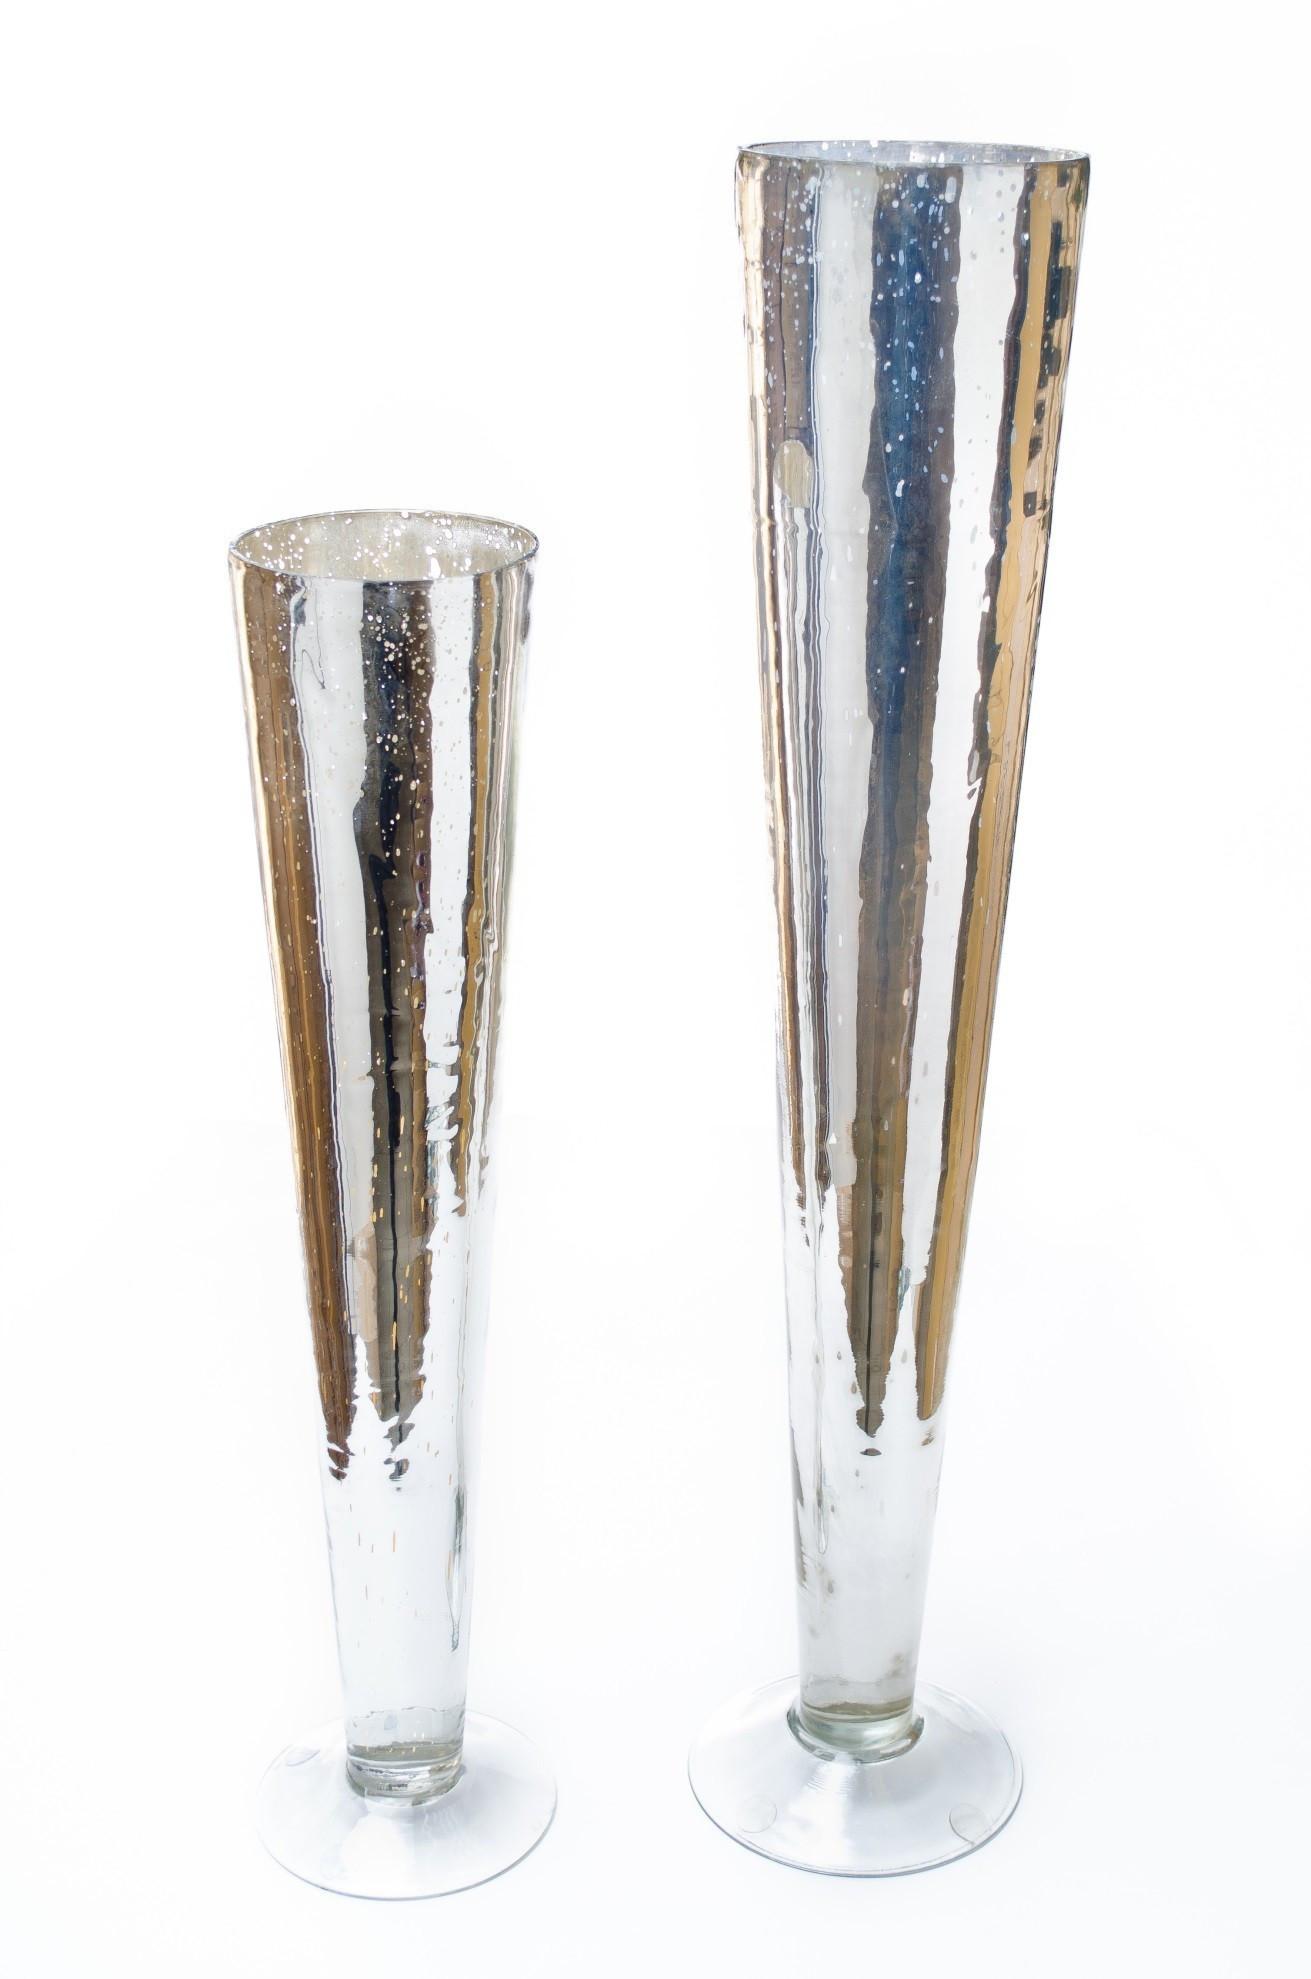 cheap gold vases wholesale of silver vases wholesale pandoraocharms us within silver vases wholesale gold mercury glass vase large